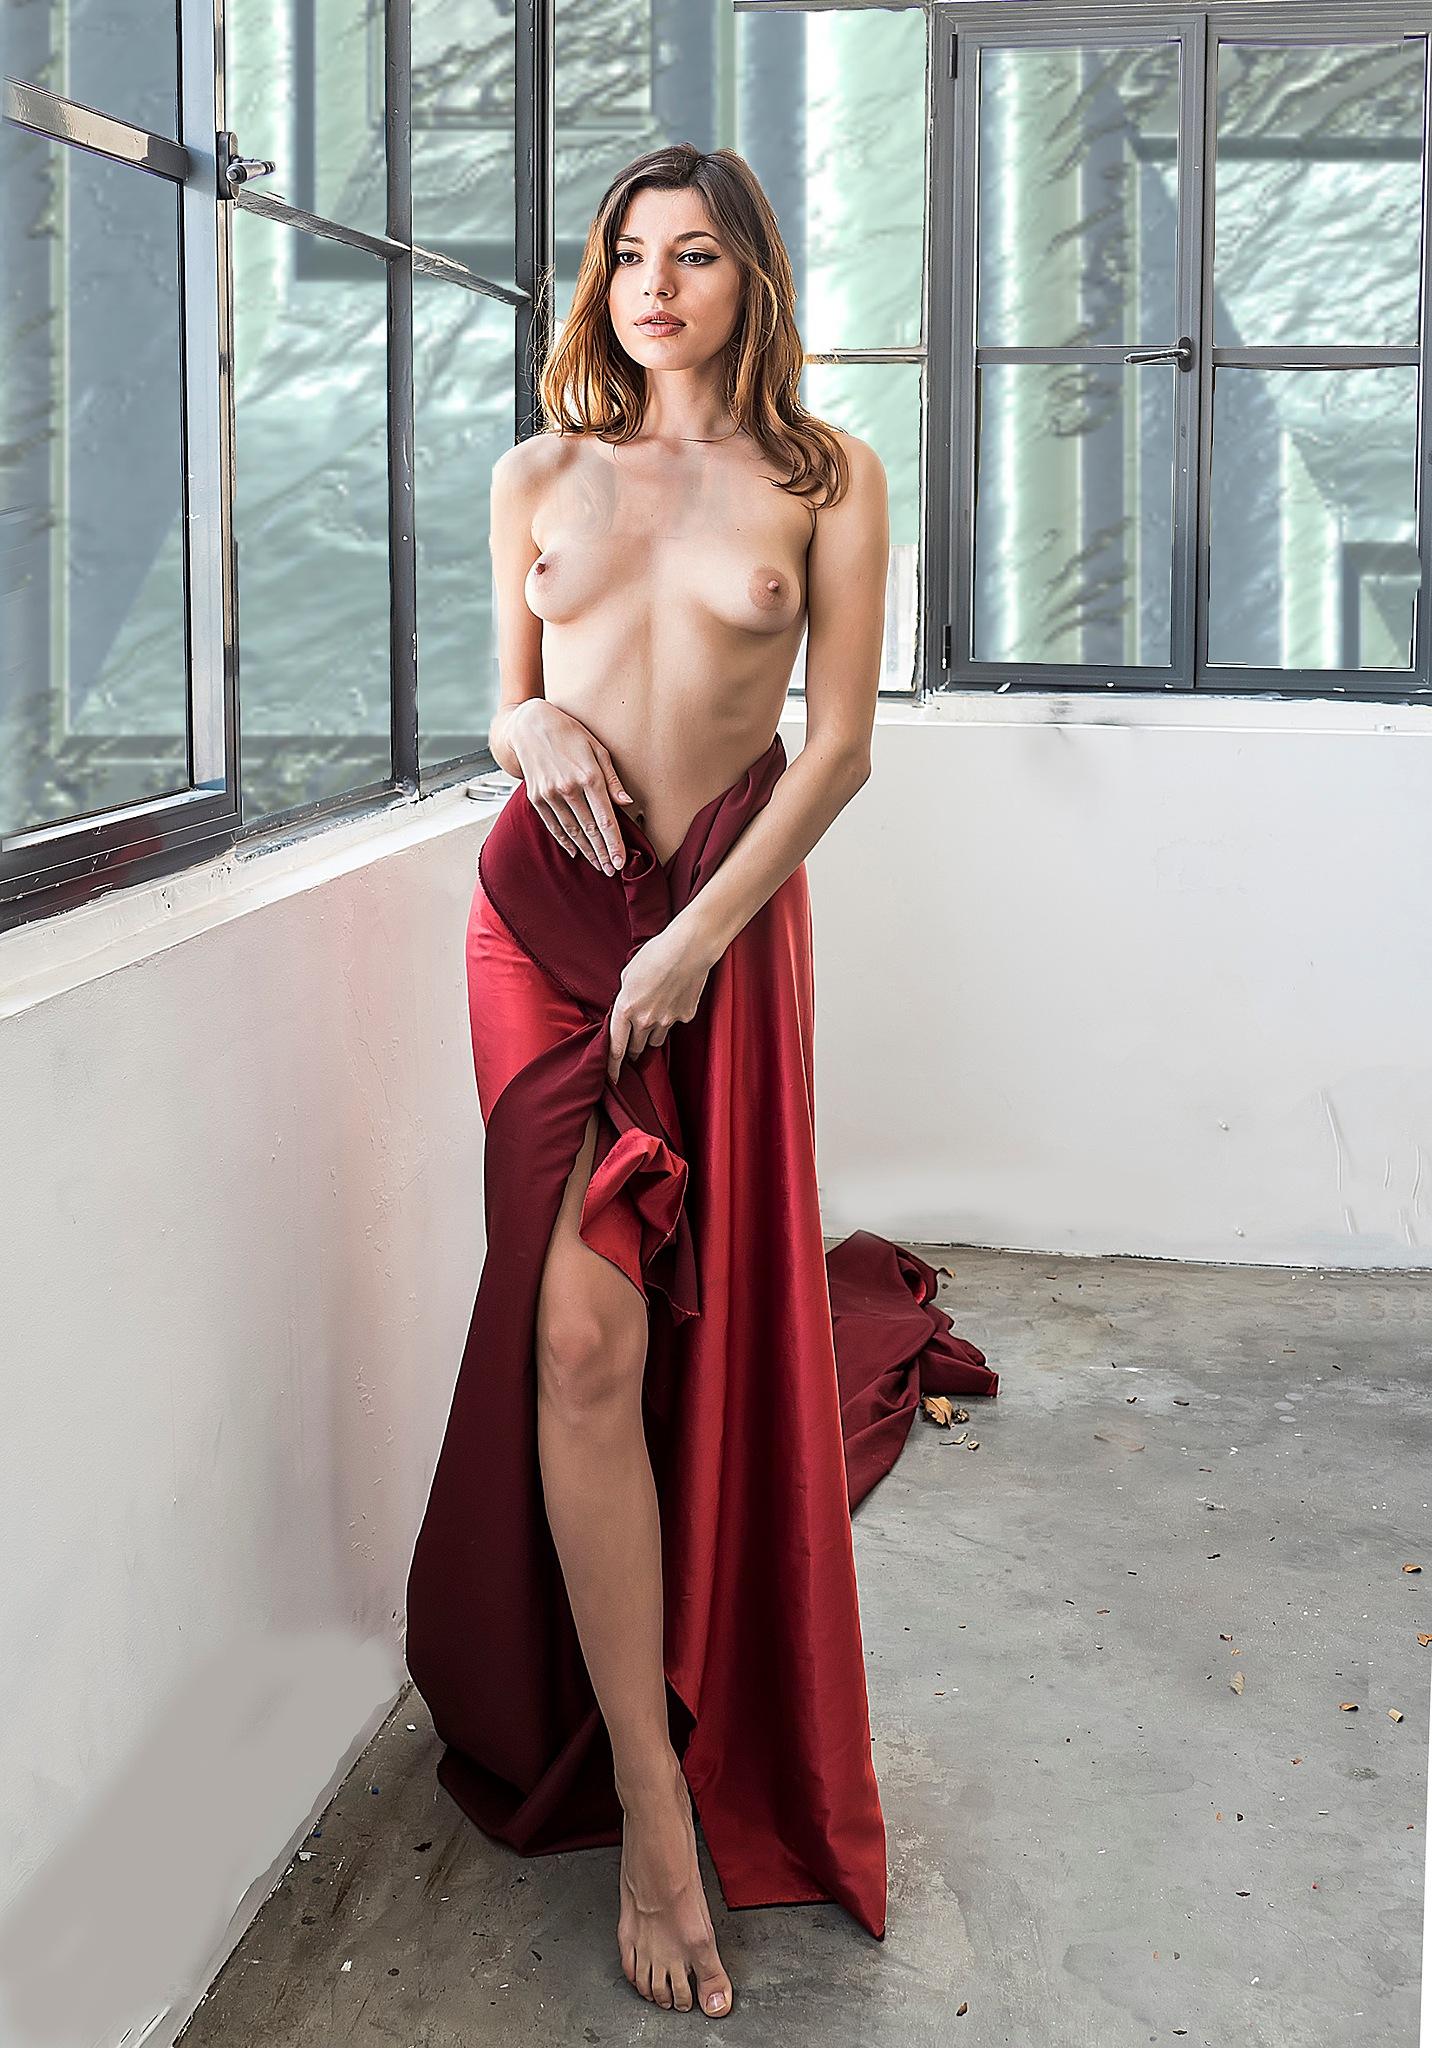 Oxana walking away by Rebecca Danieli